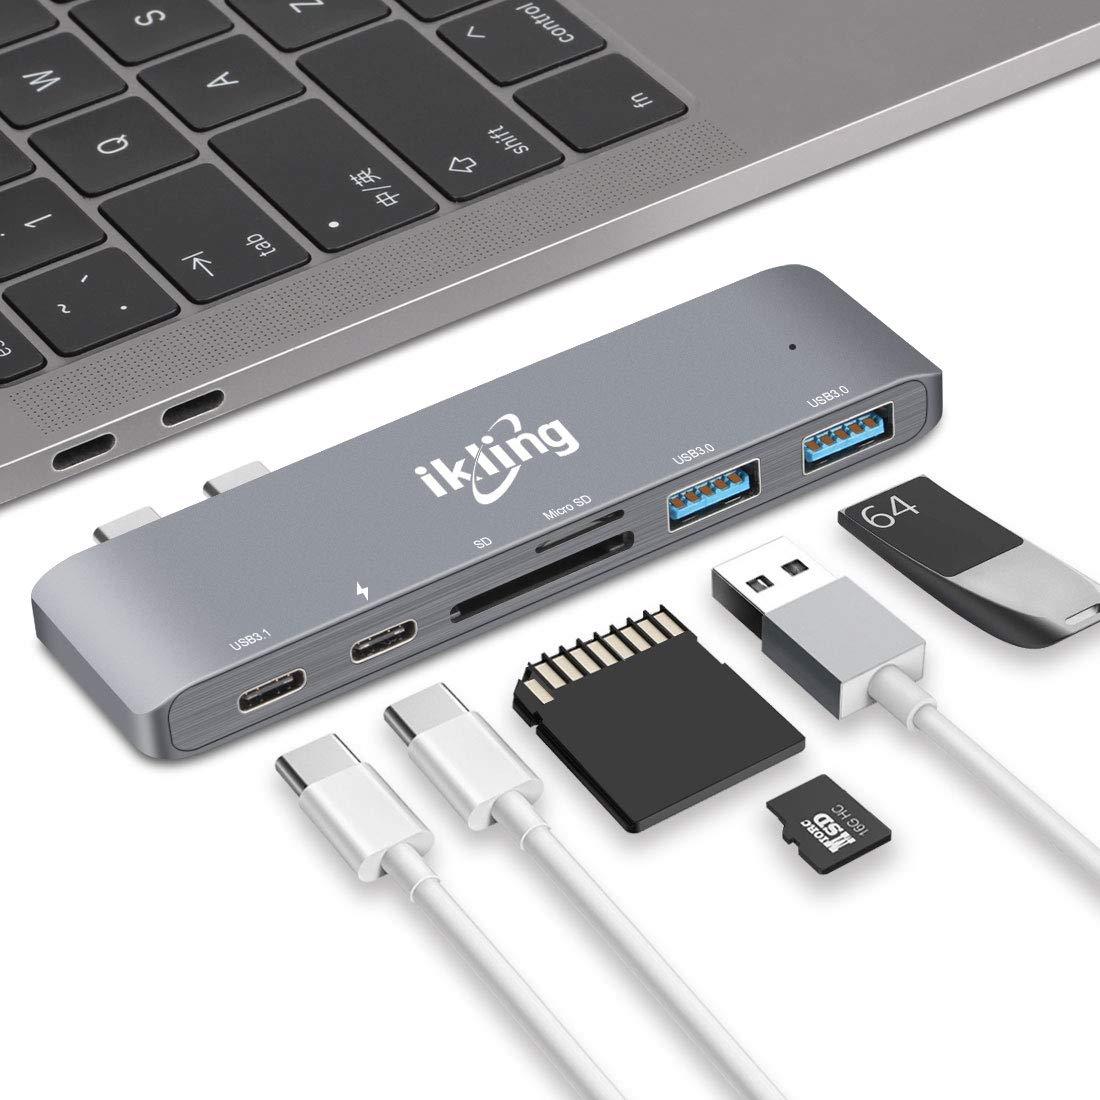 USB C Hub Multiport Charging Adapter - ikling USB Type C Hub Thunderbolt 3 Port, 40Gbps TB 3, SD/TF Card Reader, 2 USB 3.0, USB C 3.1, Power Delivery Type C Charging Port